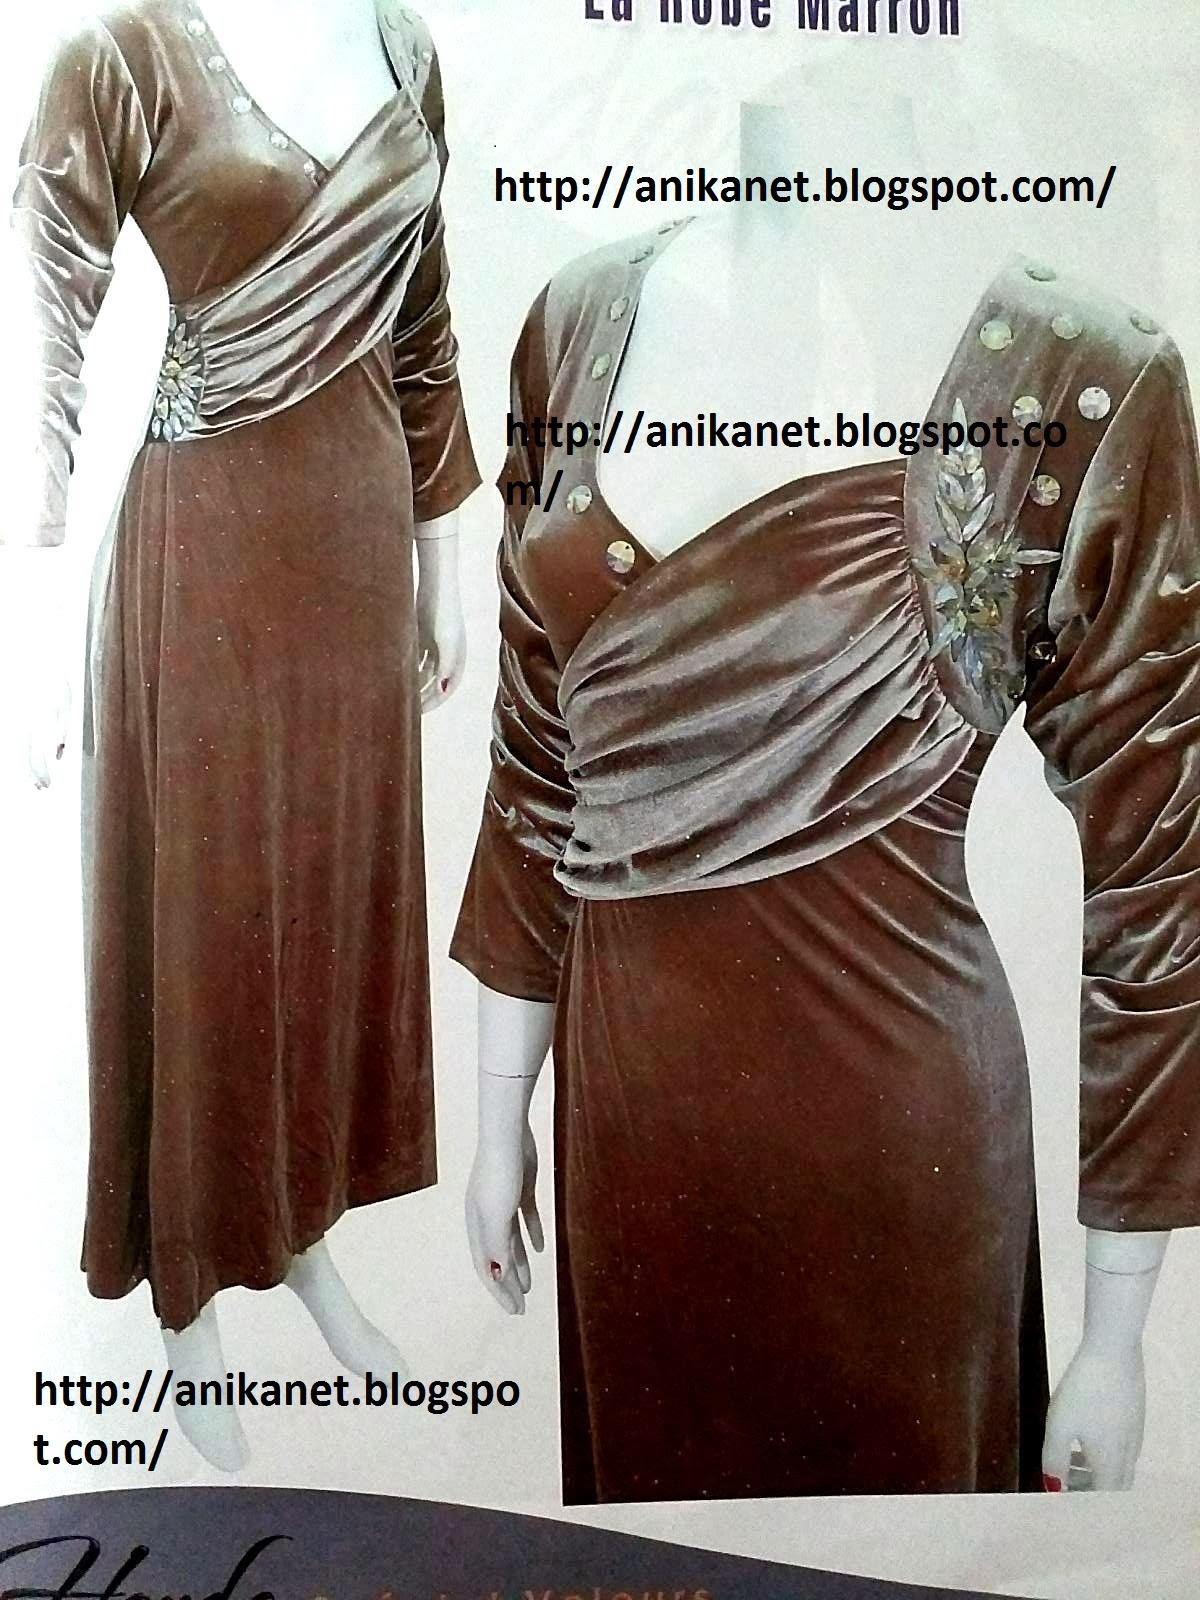 Gnader algerien 2015 gnader algerie micro 2015 robe for Interieur algerien